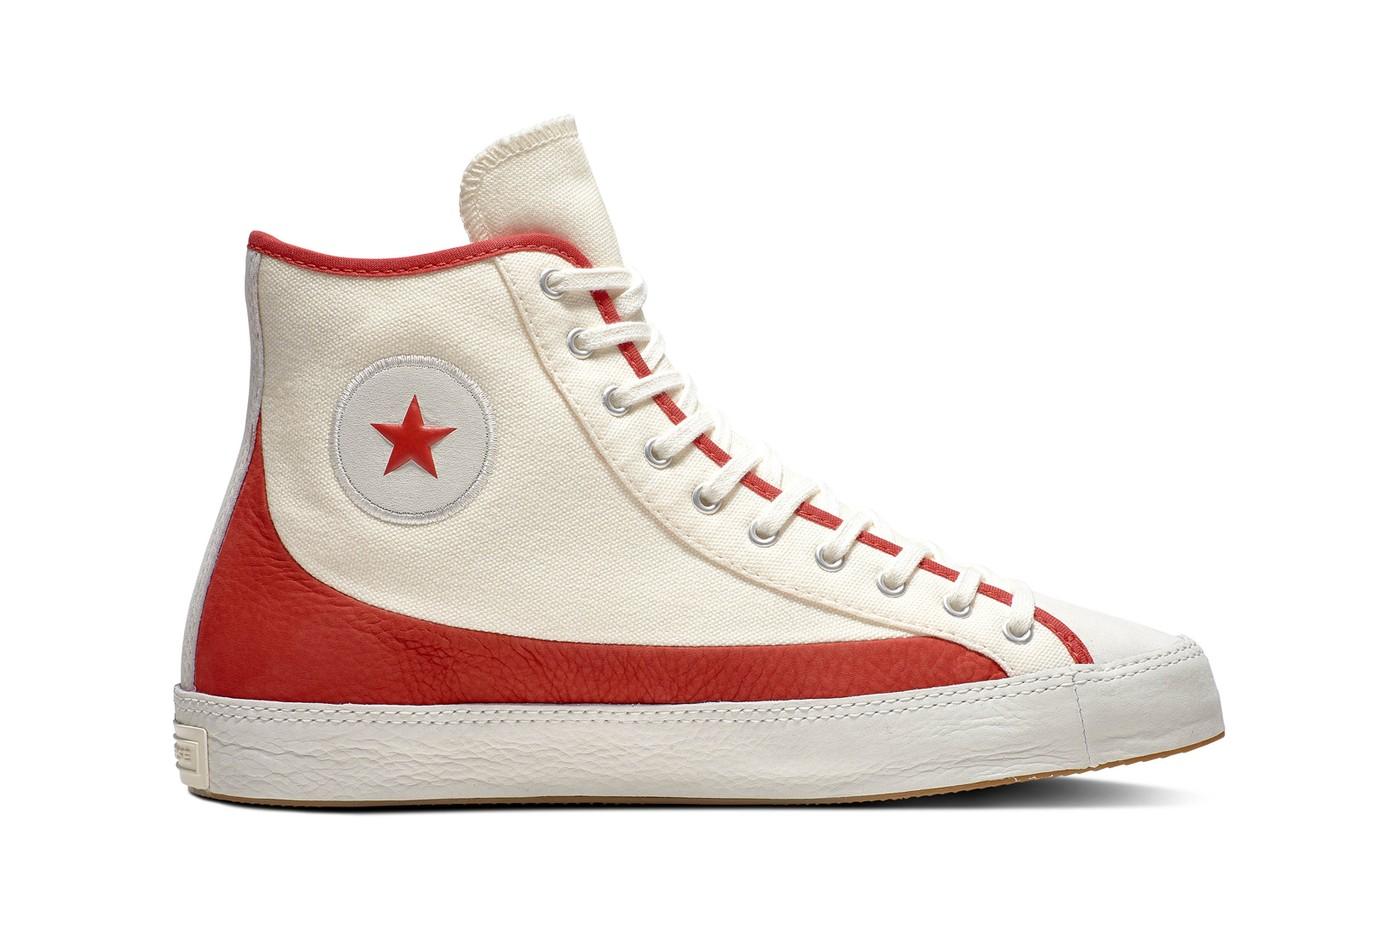 "Converse khoe hai phiên bản giày mới trong BST ""Bloom In Season"""